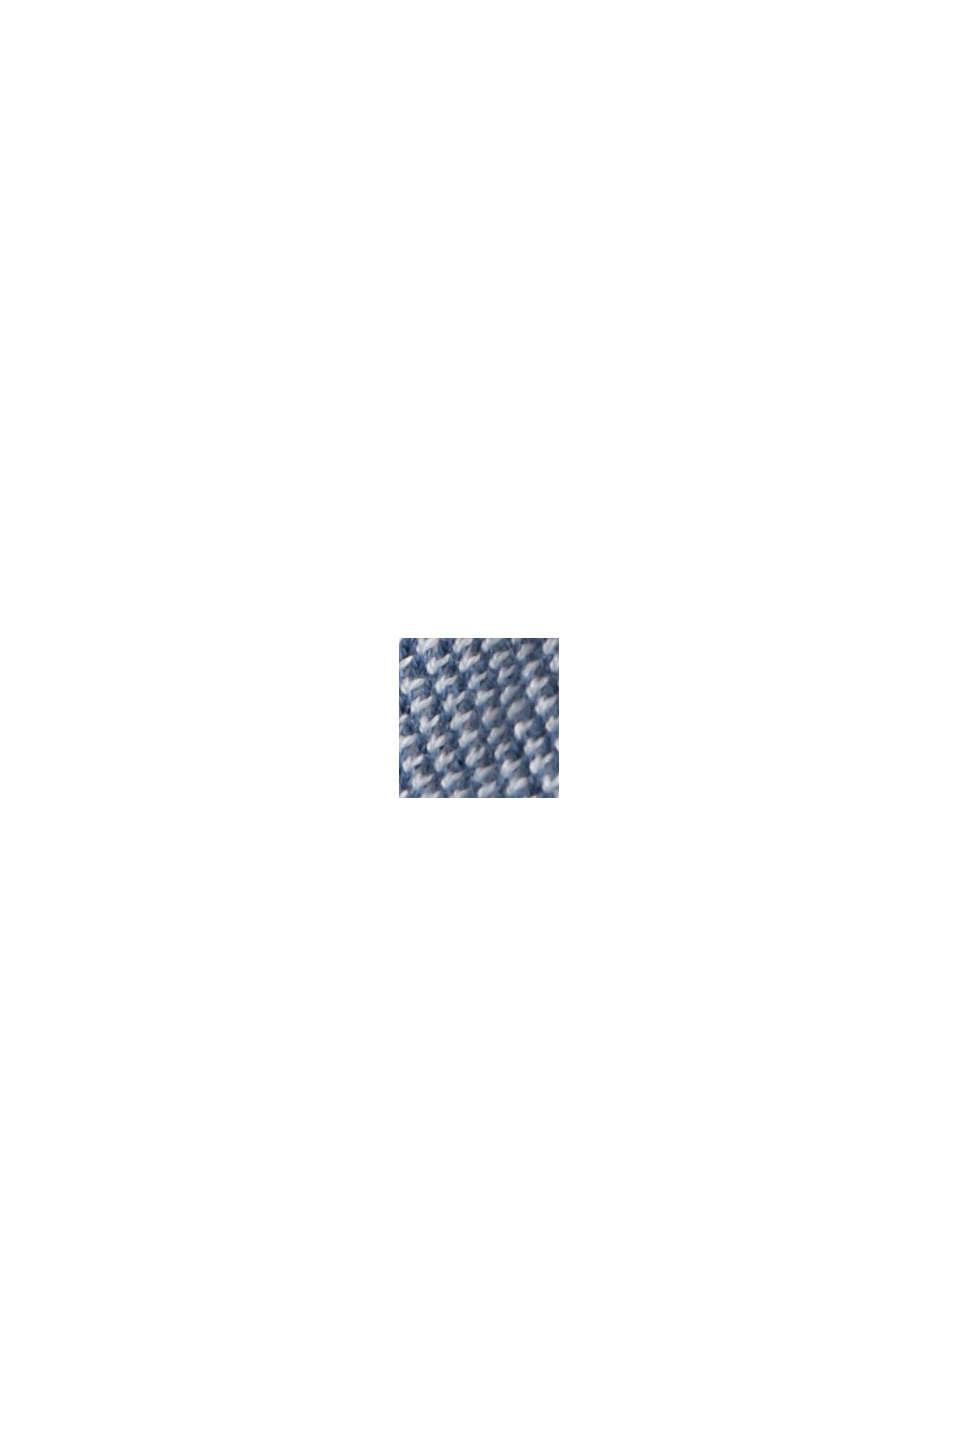 Jerseykjole med bælte, 100% økobomuld, BRIGHT BLUE, swatch